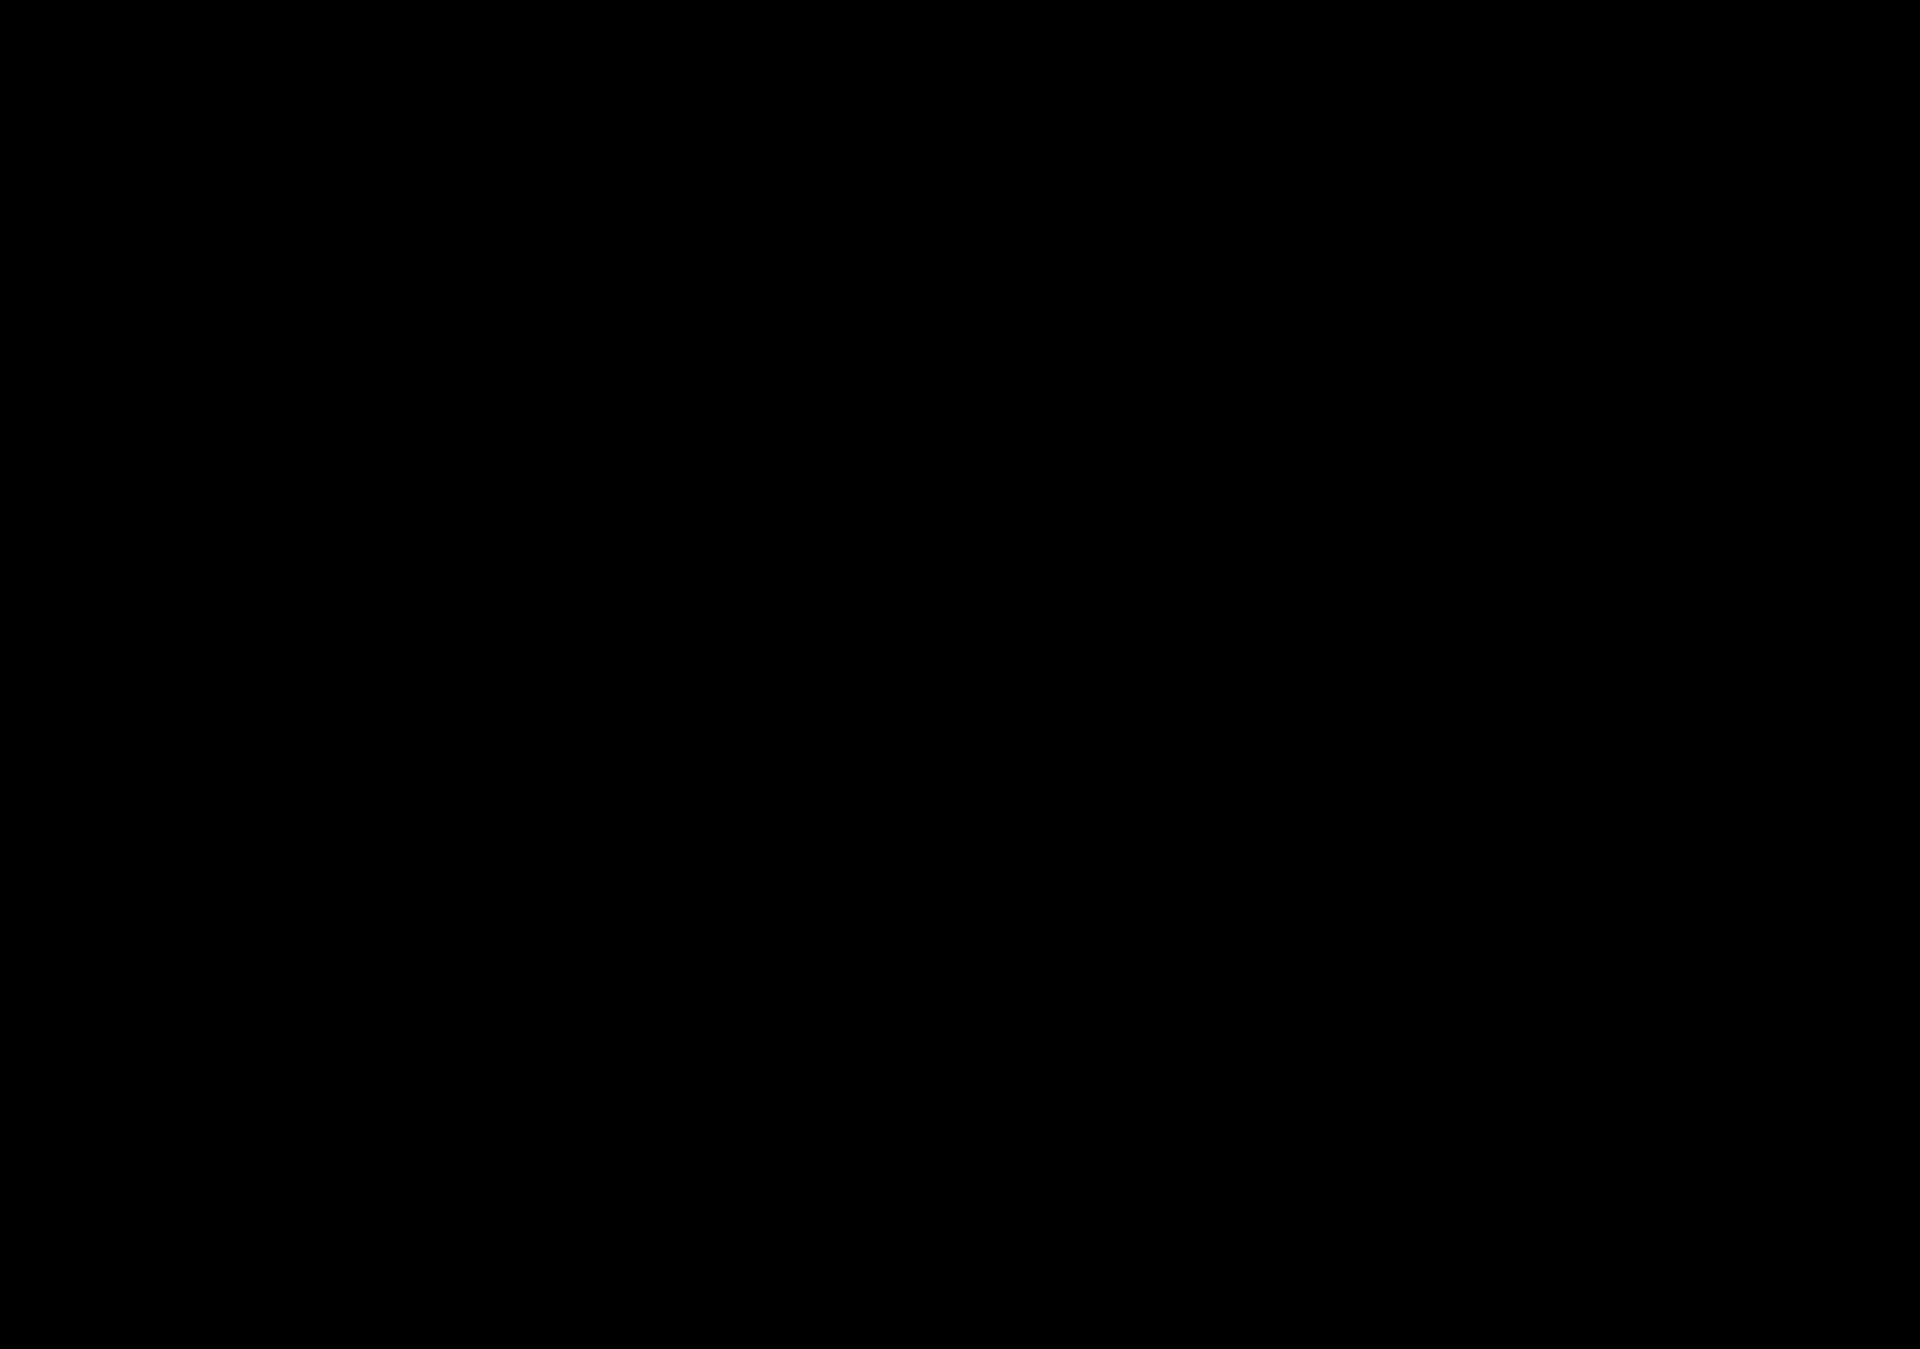 bb4b39c197284e4a5e